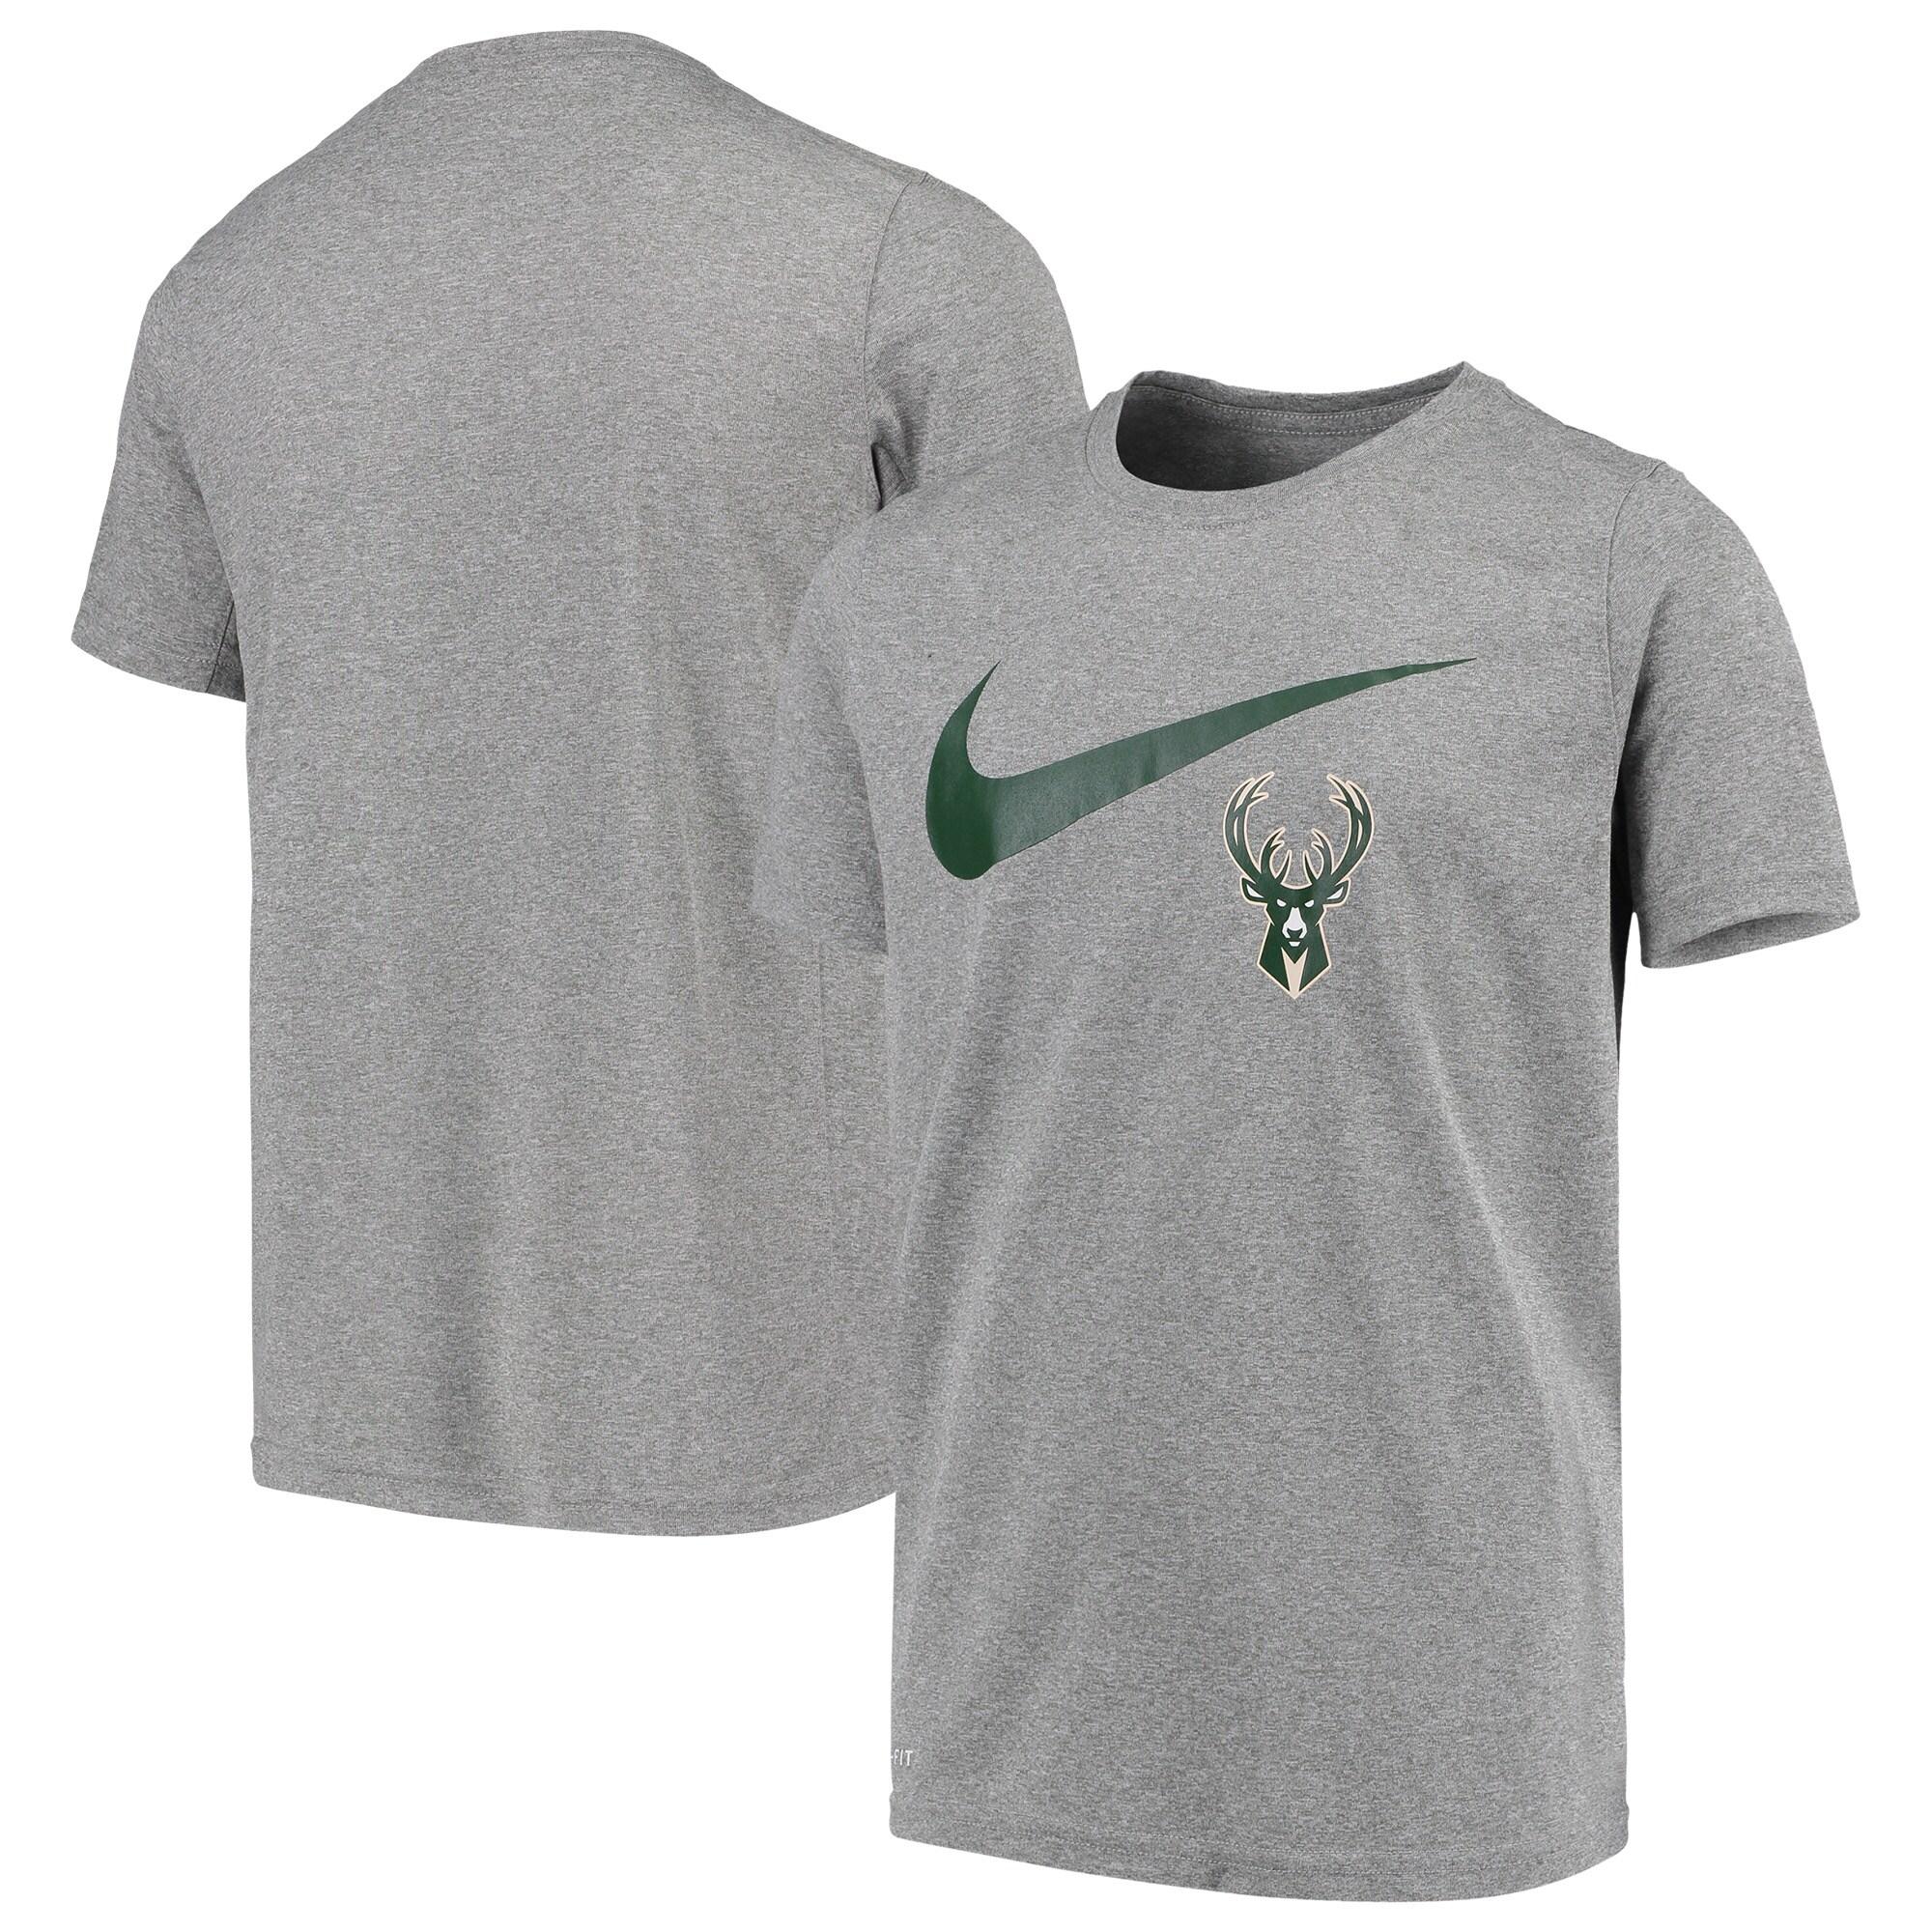 Milwaukee Bucks Nike Youth Swoosh Logo Legend T-Shirt - Heathered Gray